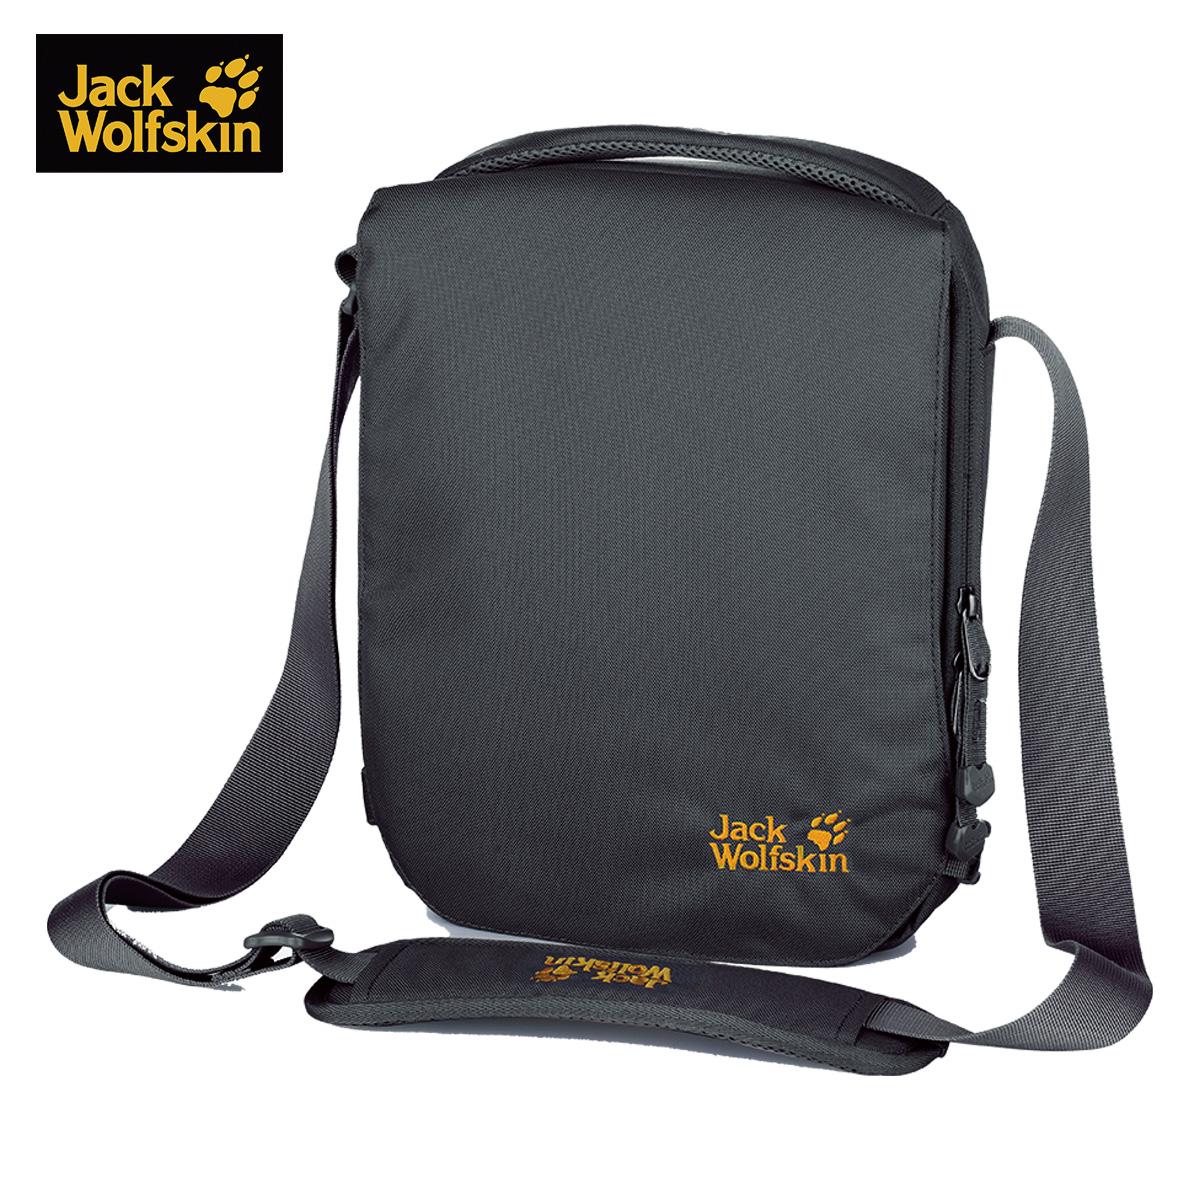 JACKWOLFSKIN когти подходит для мужчин и женщин 4L бизнес мешок сумку сумка .2002772